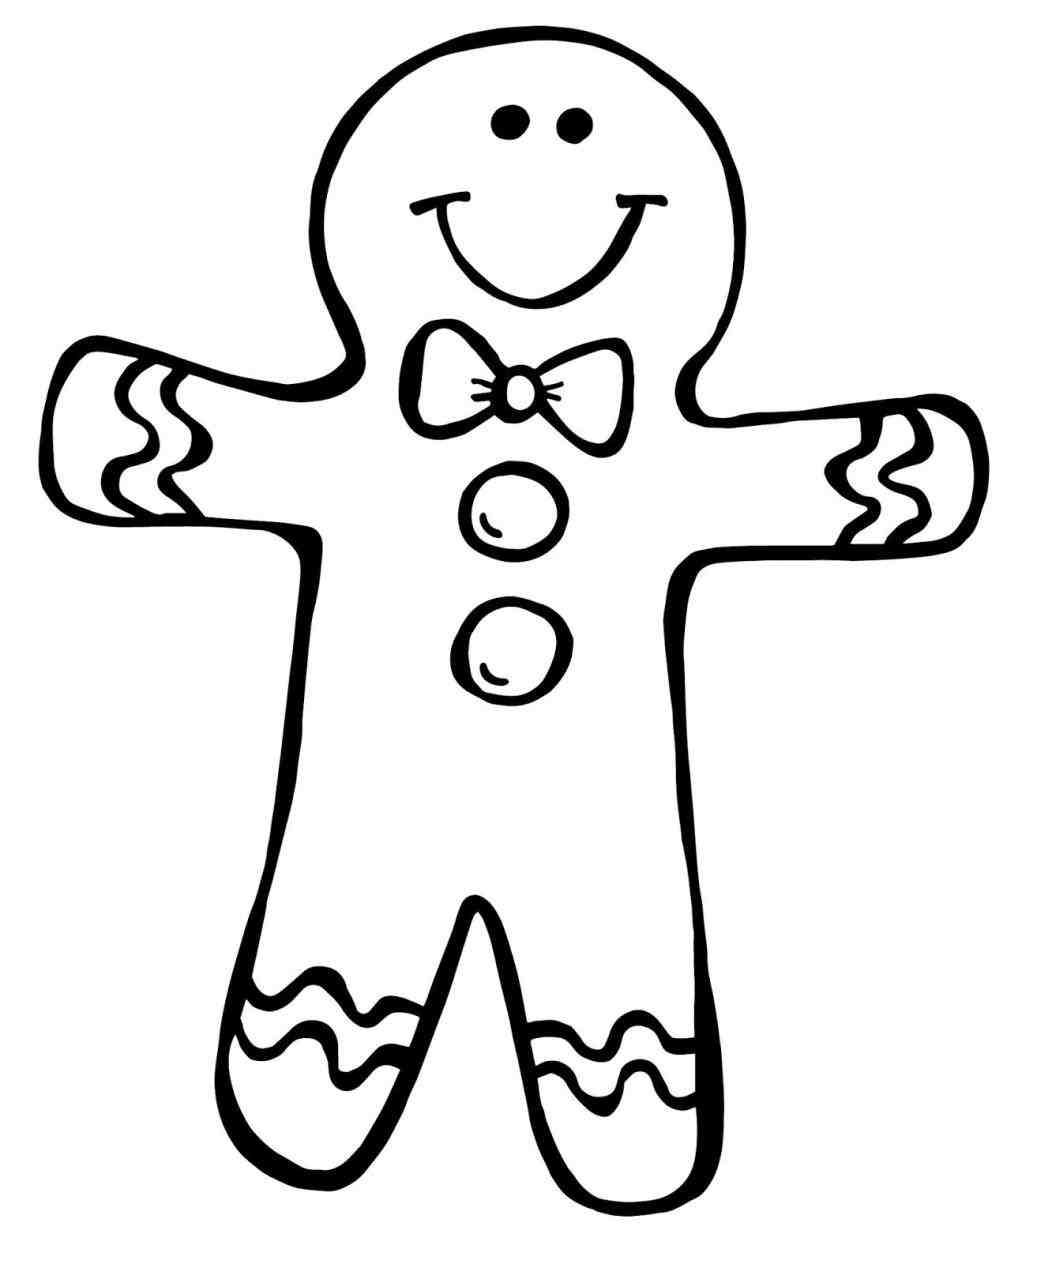 d981e0d12c58e4b1d981edf7aadcbc4a » Christmas Coloring Pages Gingerbread Boy